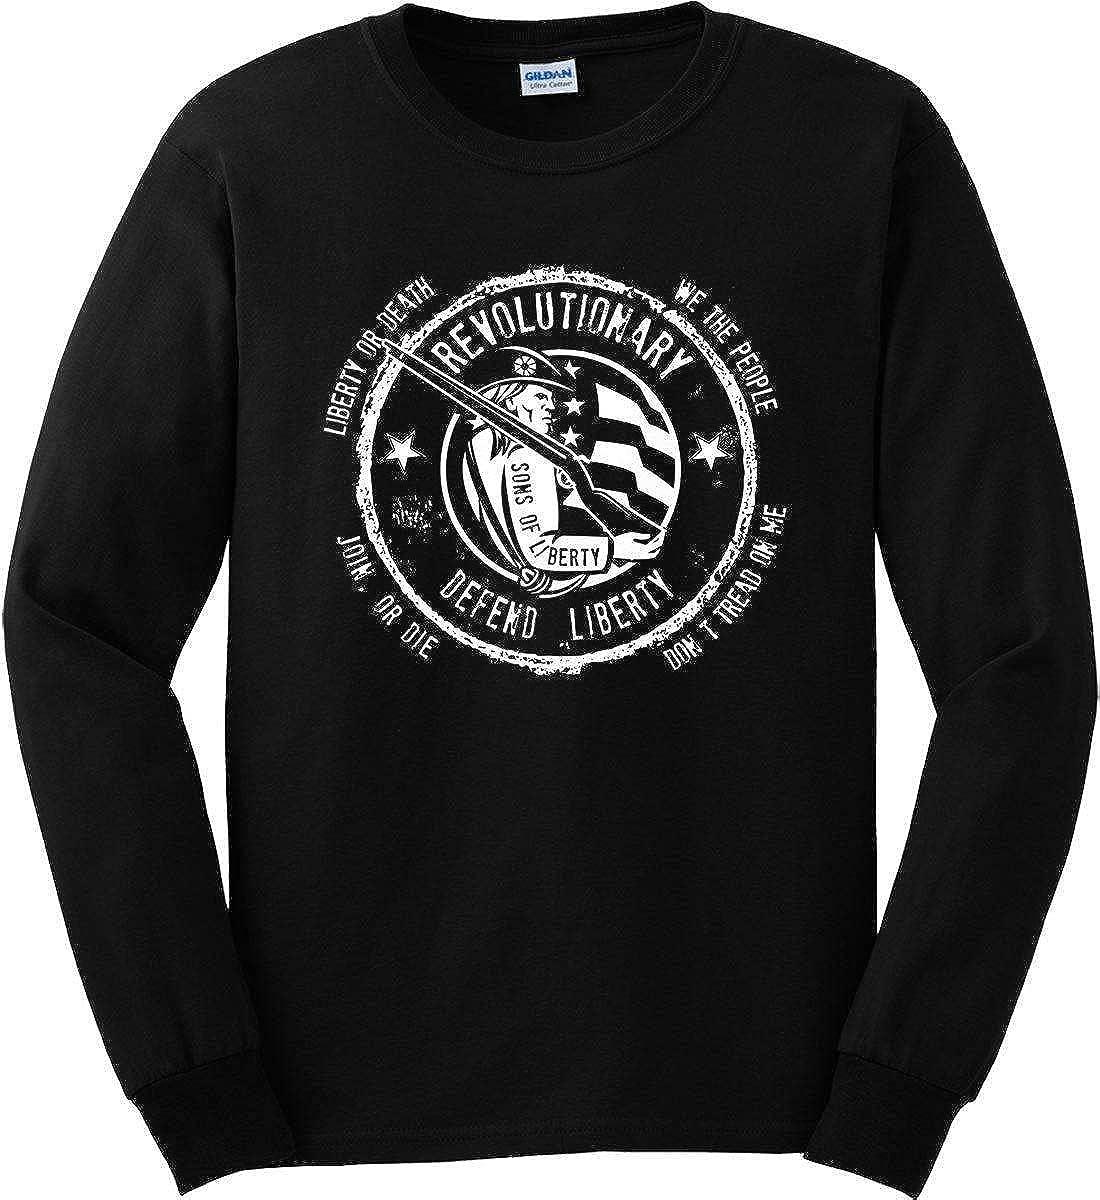 Sons Of Liberty Revolutionary Long Sleeve Shirt Defend Liberty